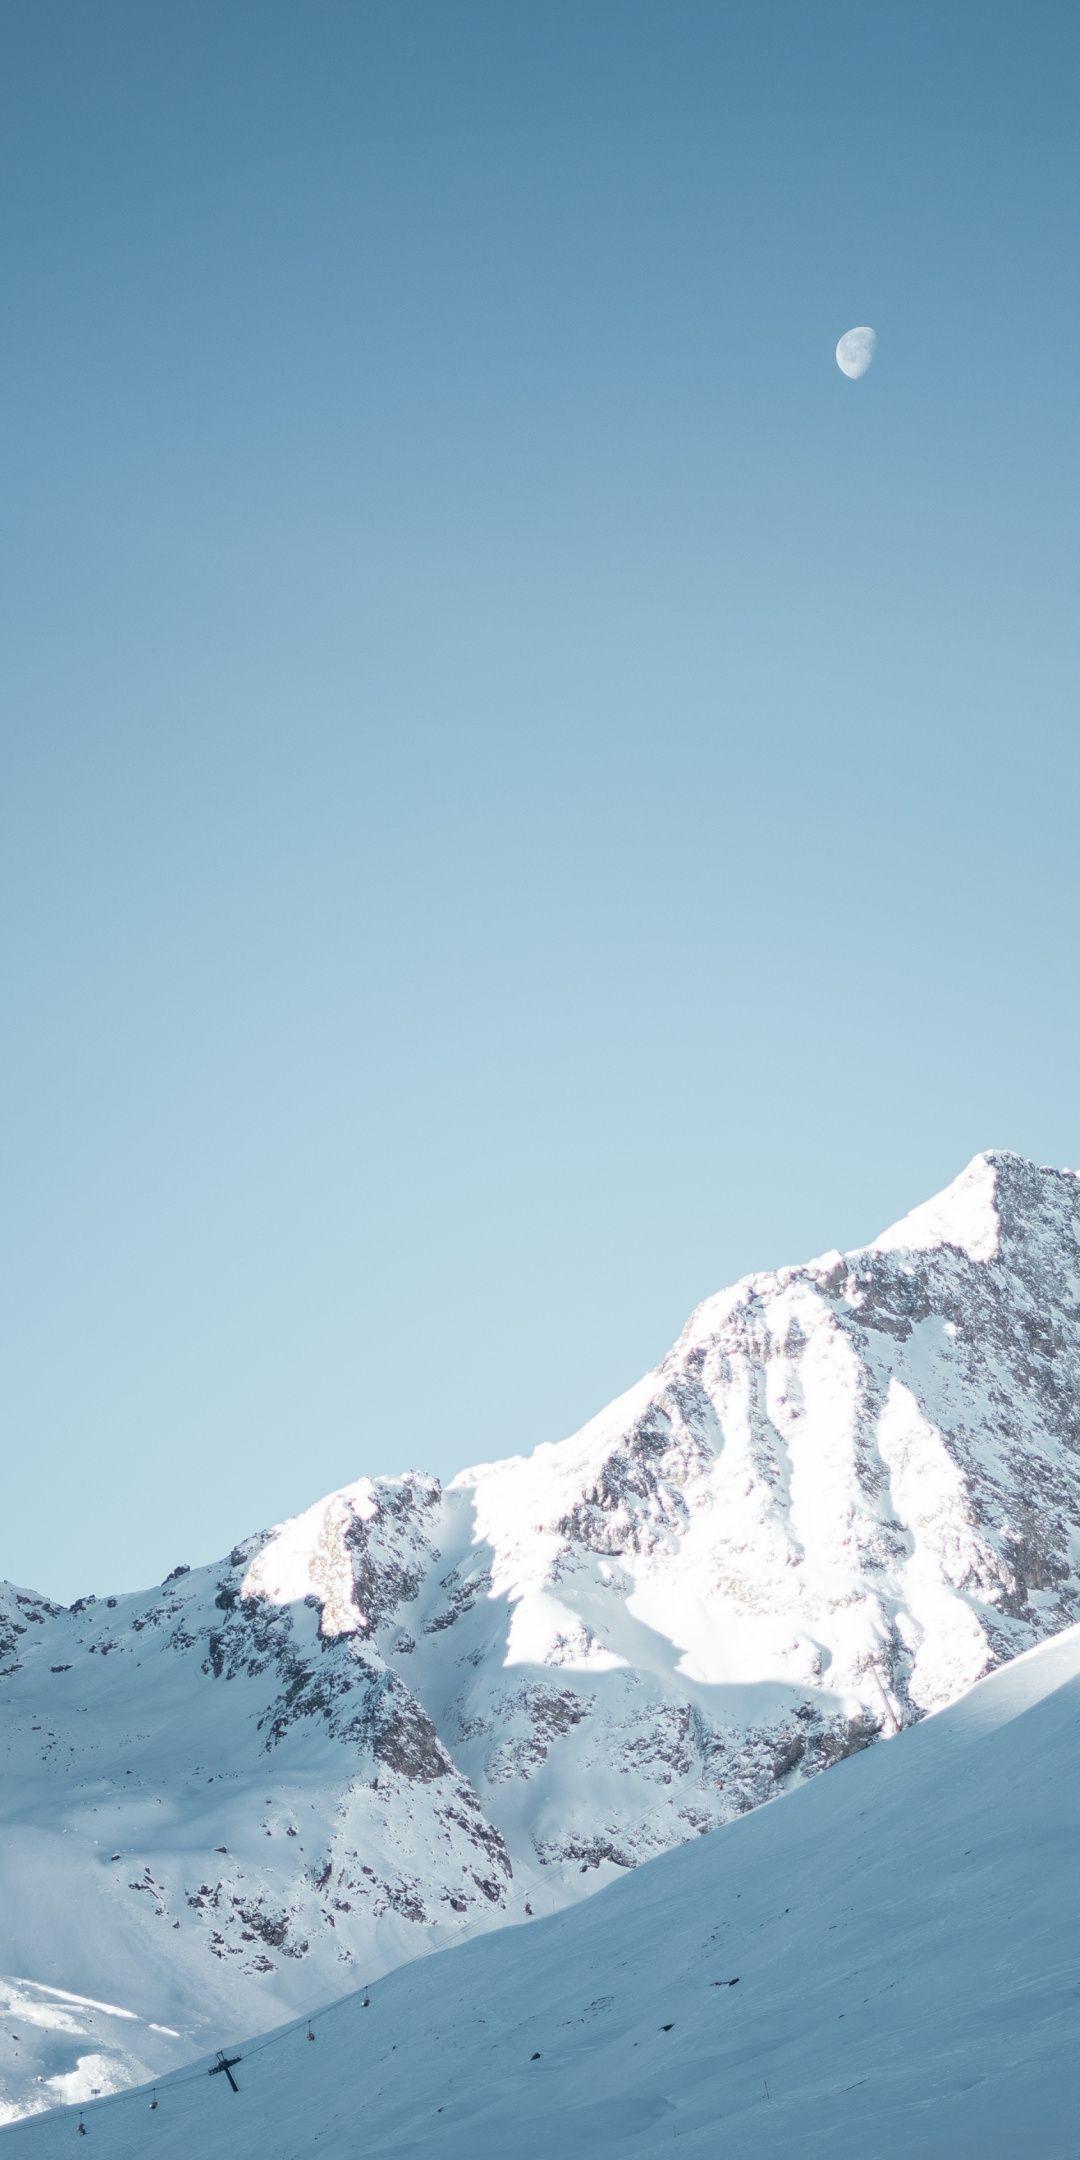 Glacier Mountains Landscape Blue Sky Sunny Day Nature 1080x2160 Wallpaper Blue Sky Wallpaper Scenery Wallpaper Mountains Wallpaper